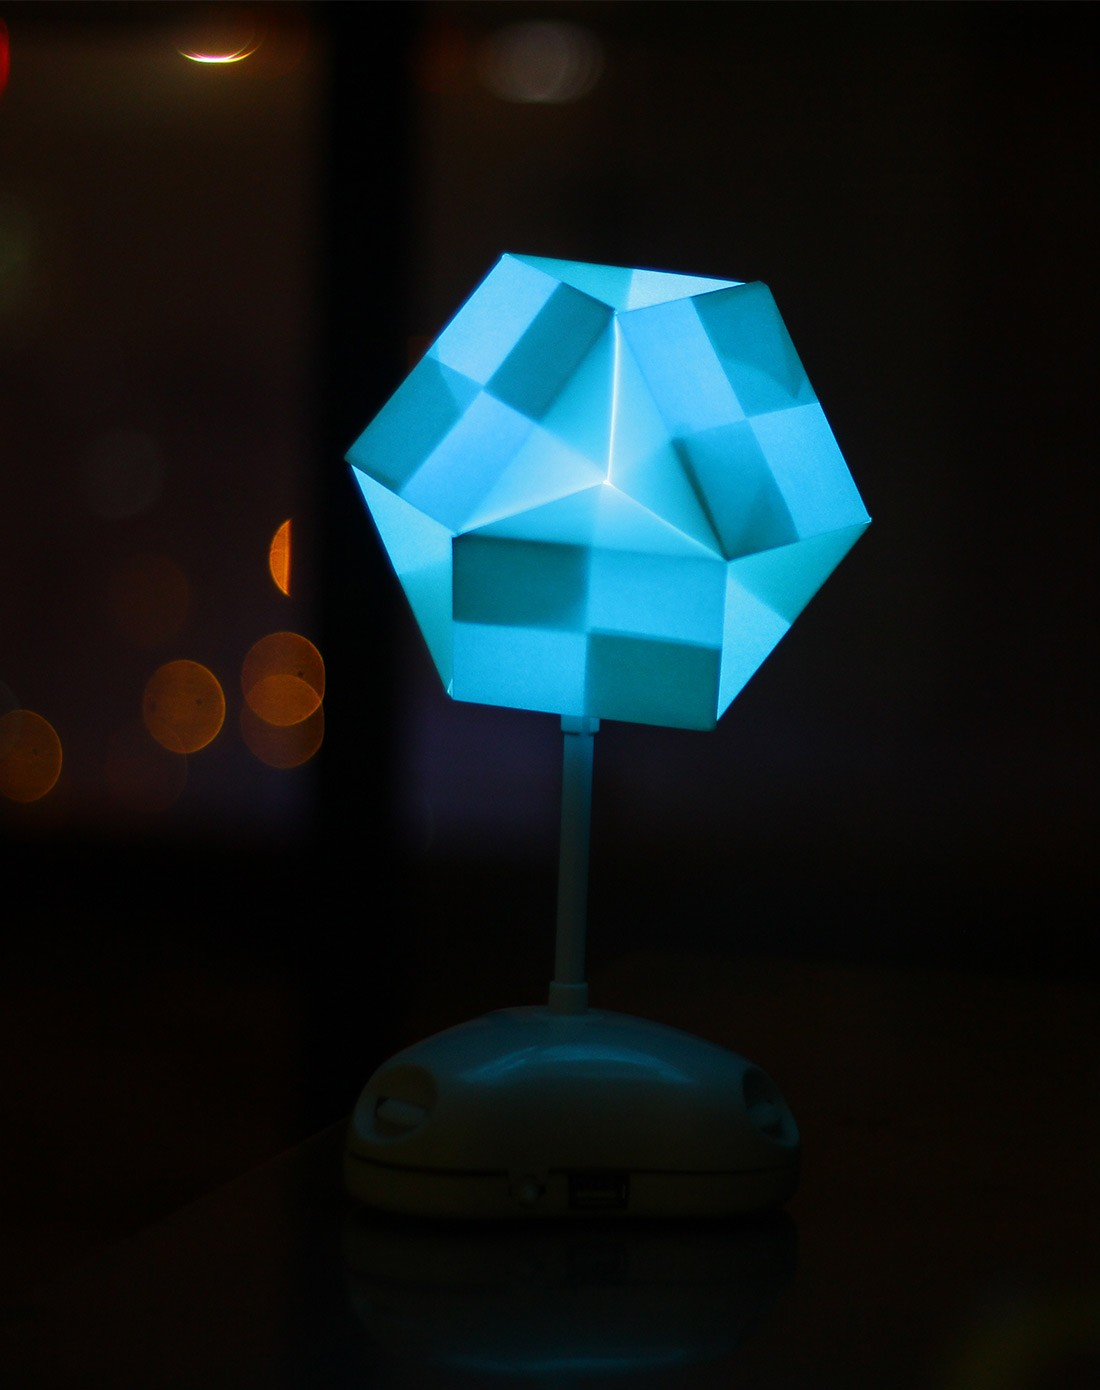 diy七彩折纸灯